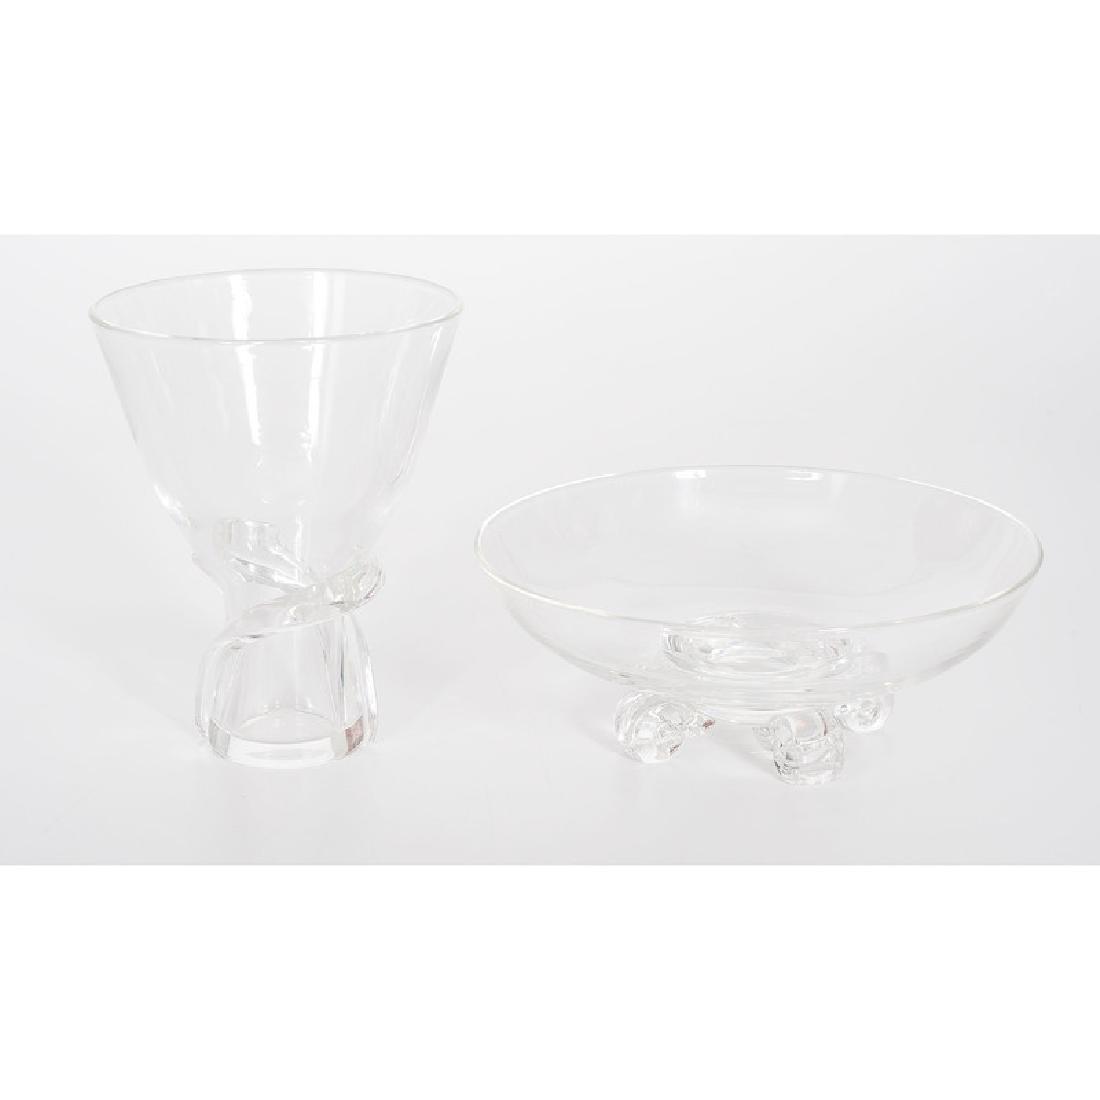 Steuben Crystal Vase and Bowl